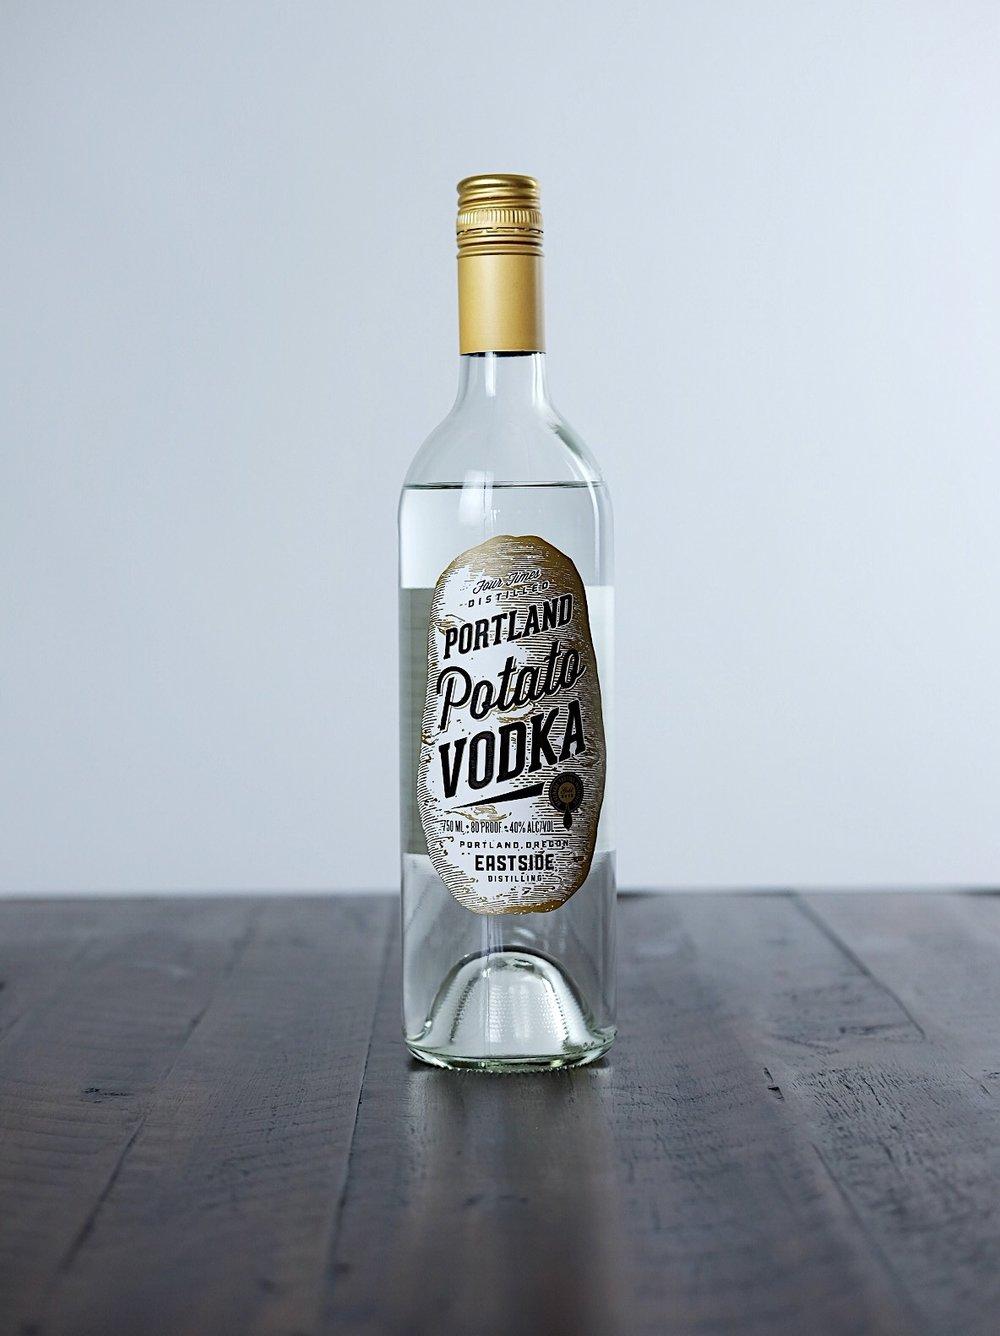 Portland Potato Vodka - AGE: unagedCOST: $18ABV: 40